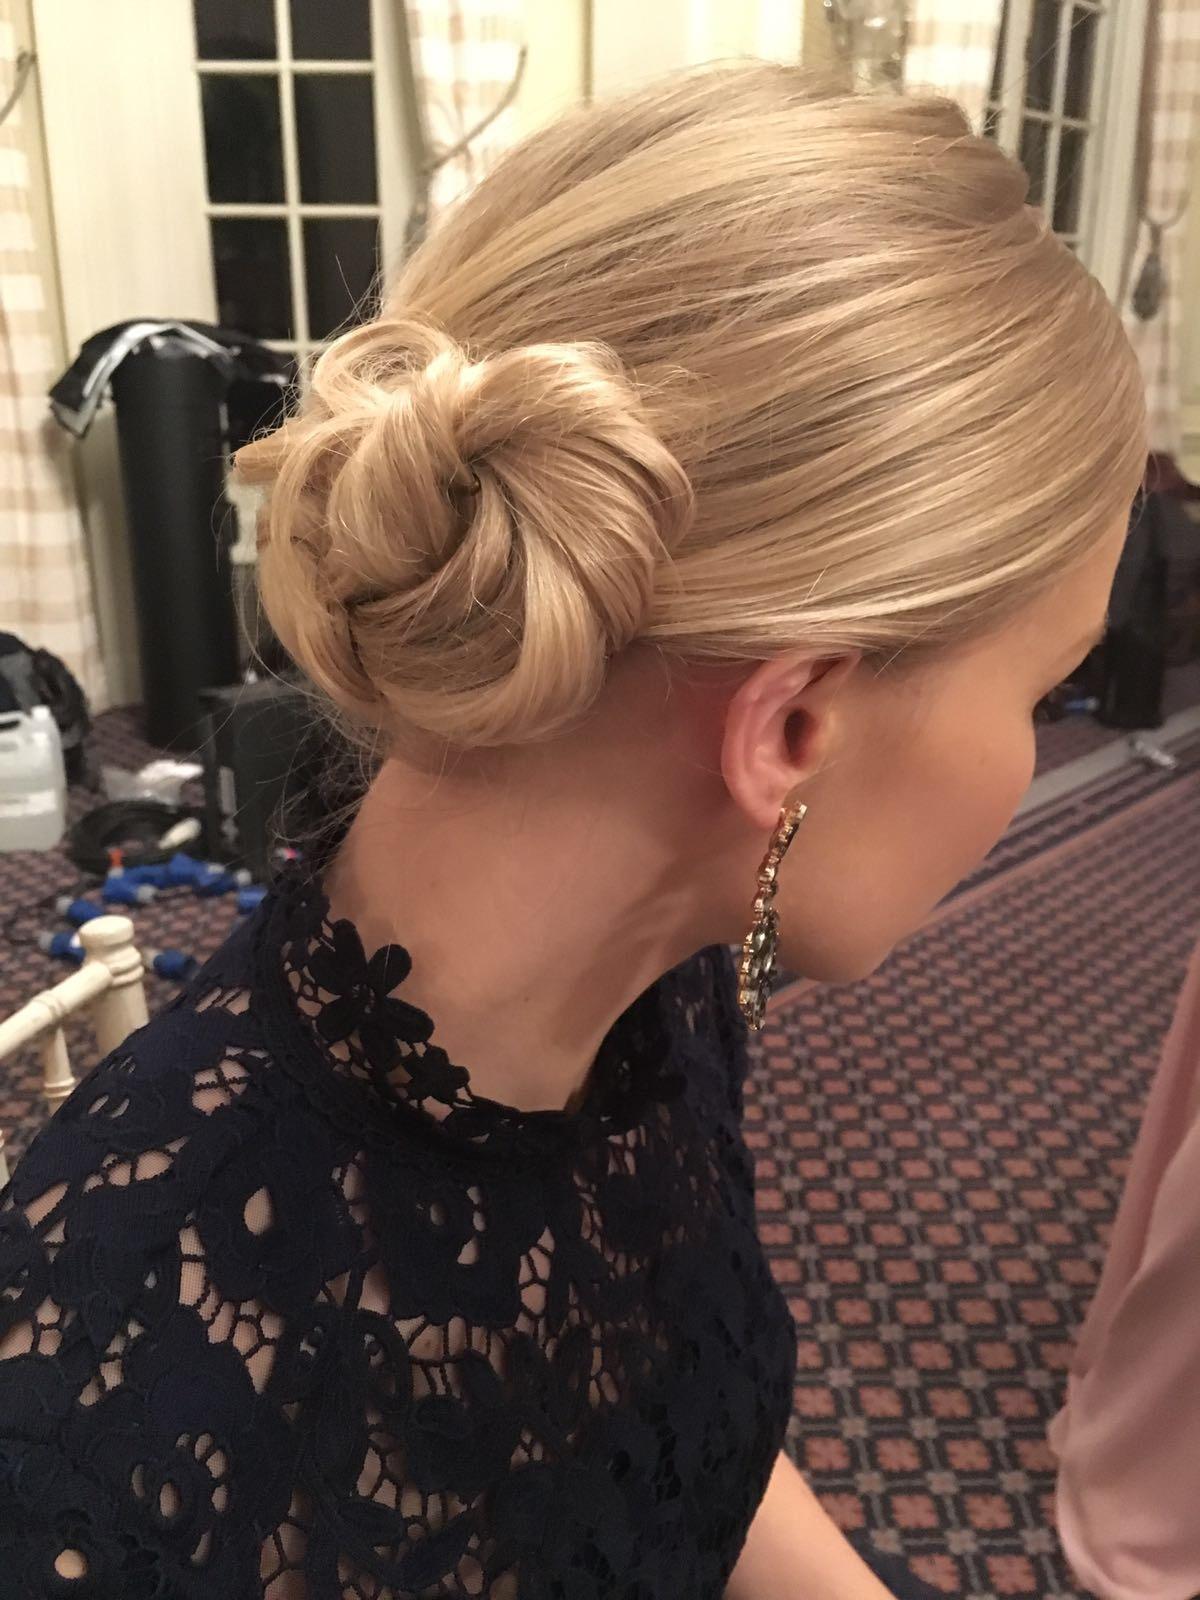 Very pretty hair creation for the last scene